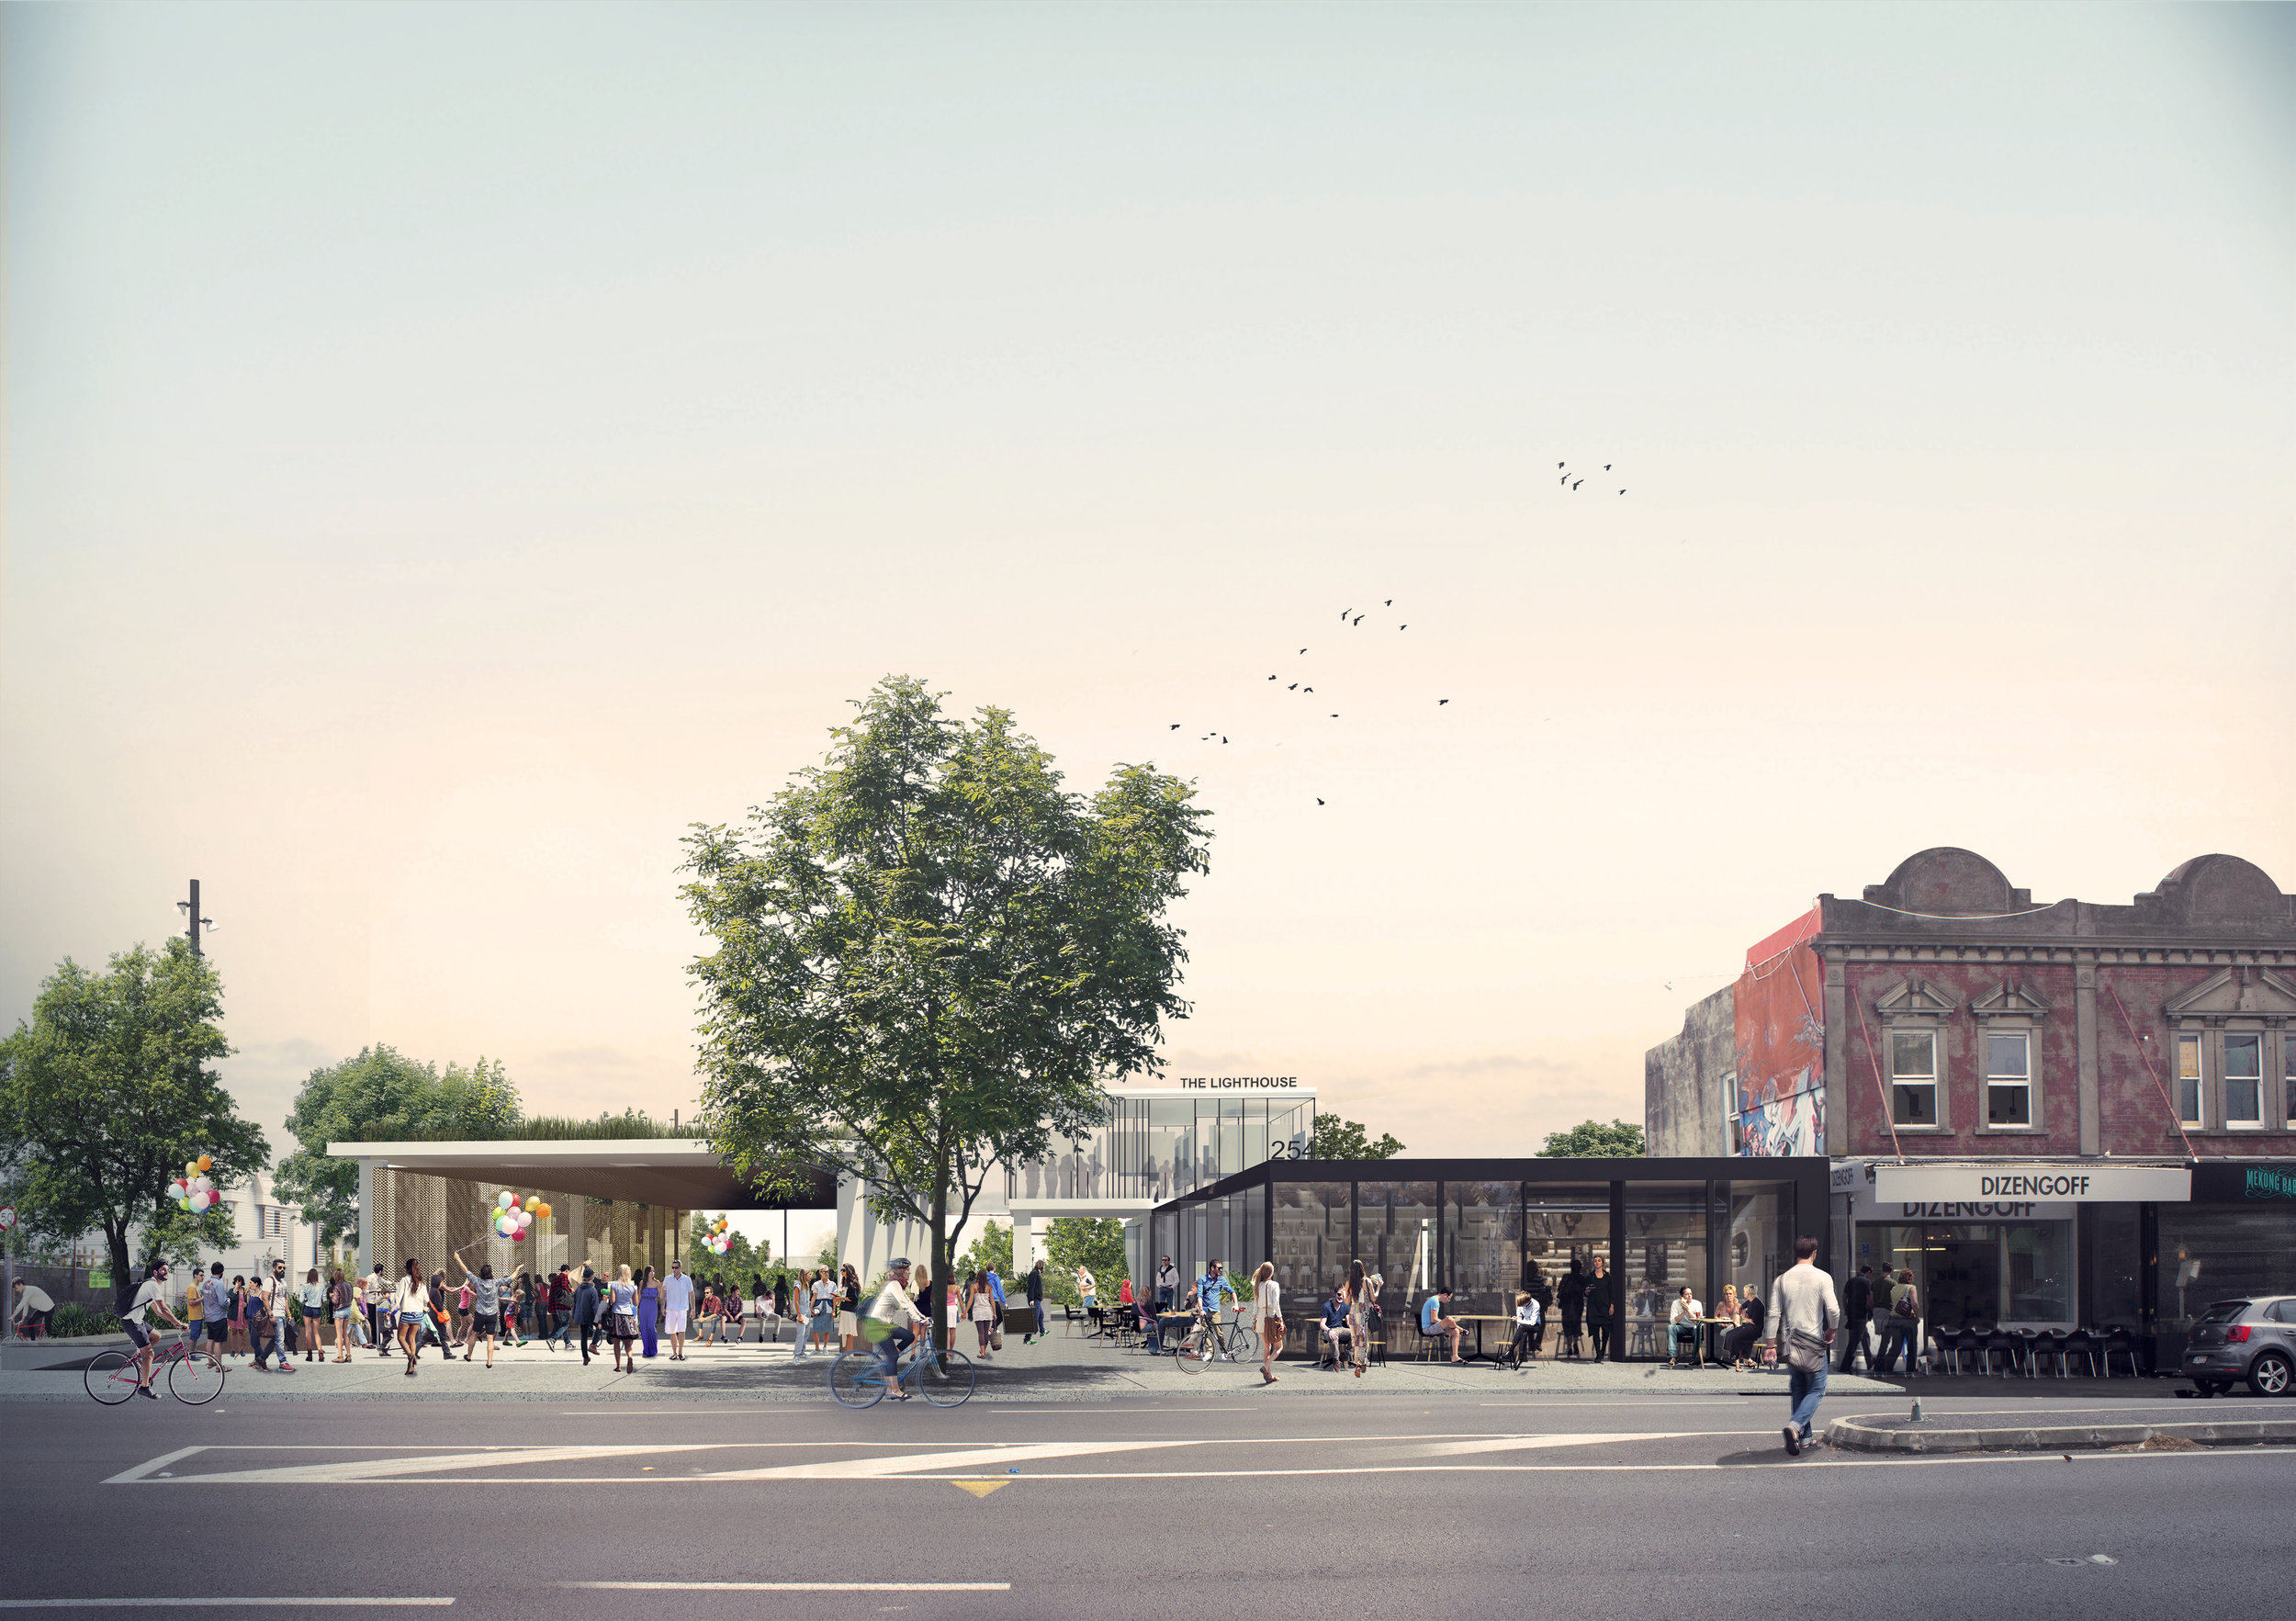 LandLAB's Ponsonby Park design seeks to redefine what a park is.